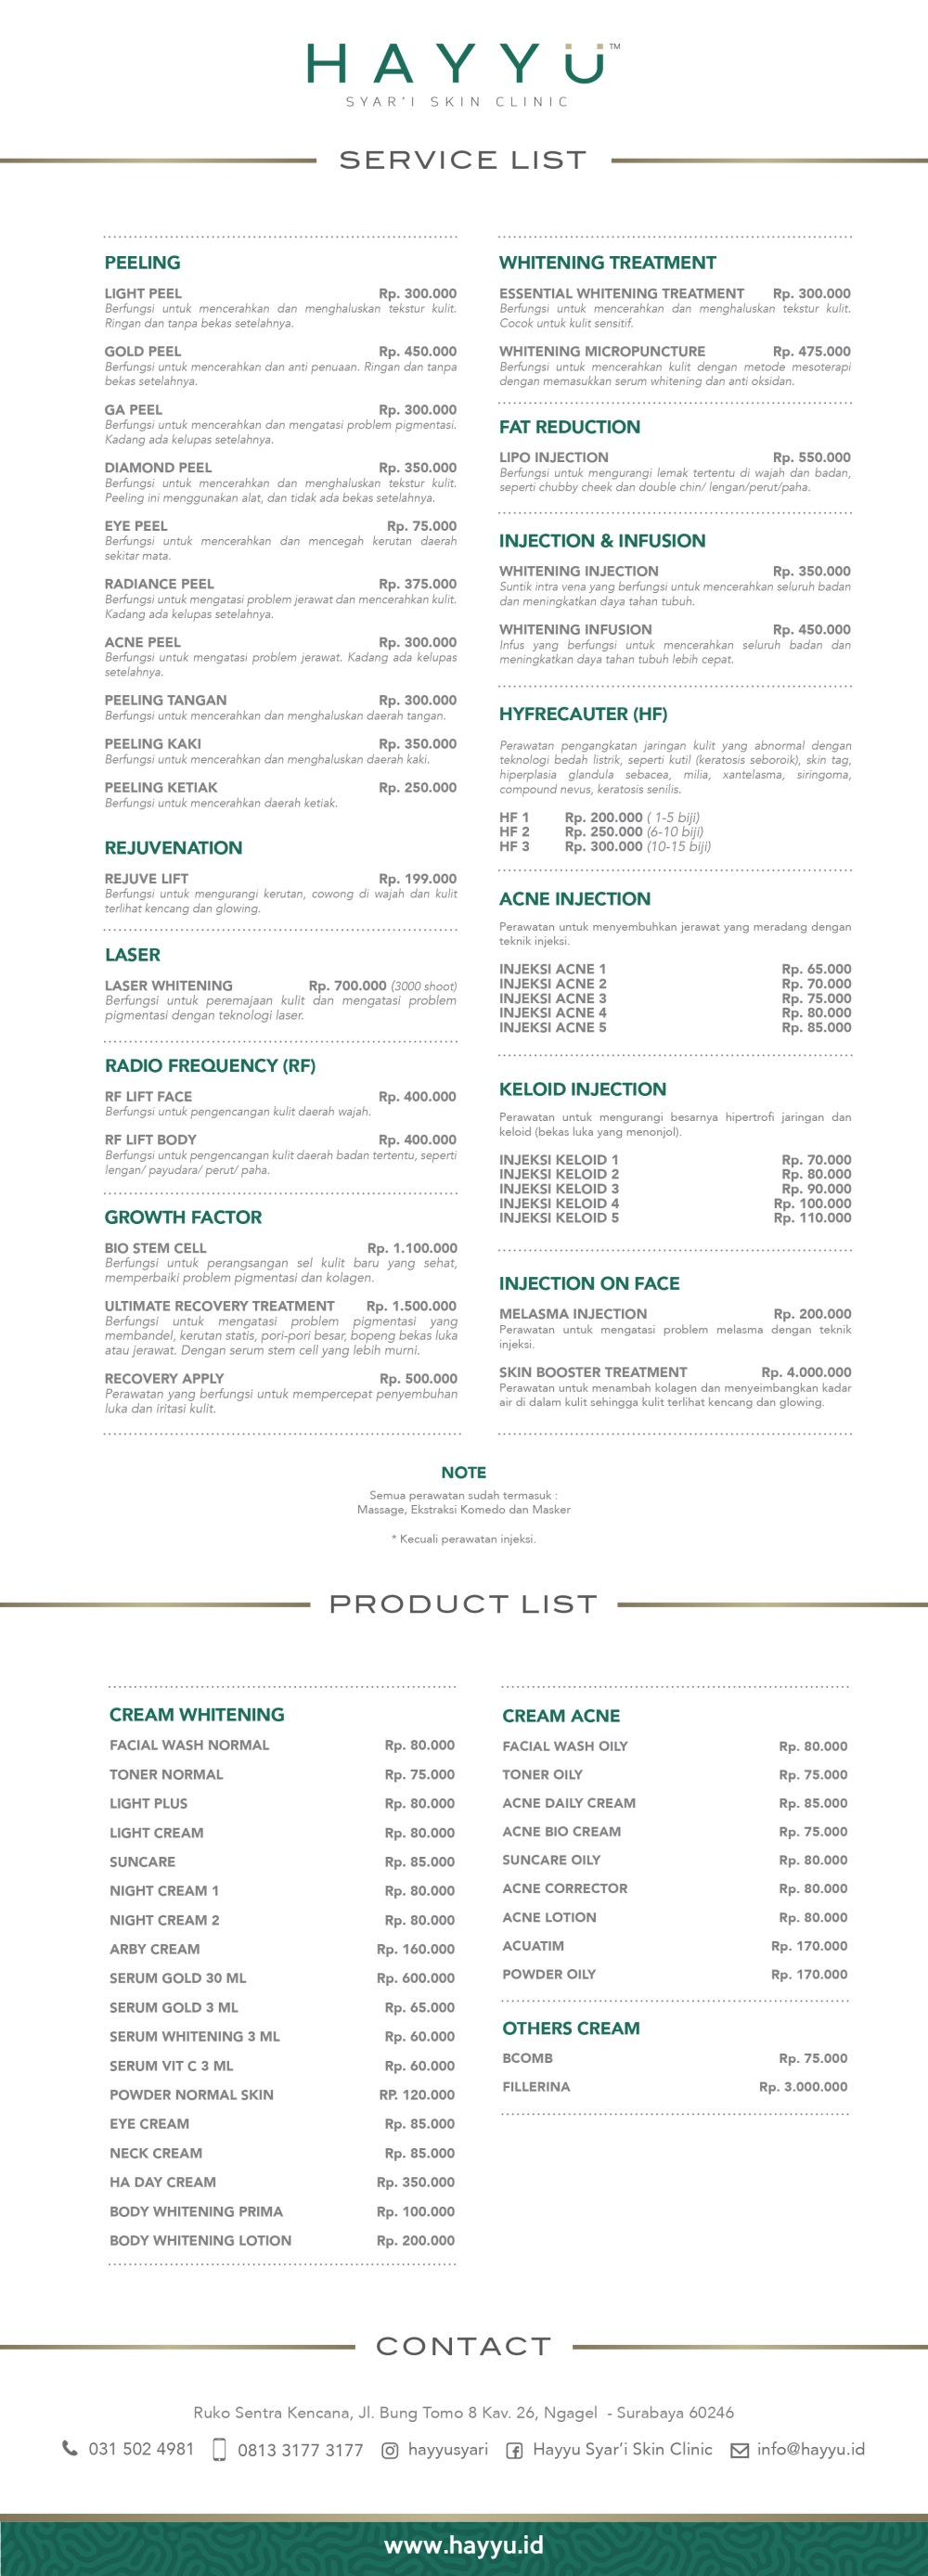 HAYYU Syar'i Skin Clinic- PRICE LIST - 27 April 2017